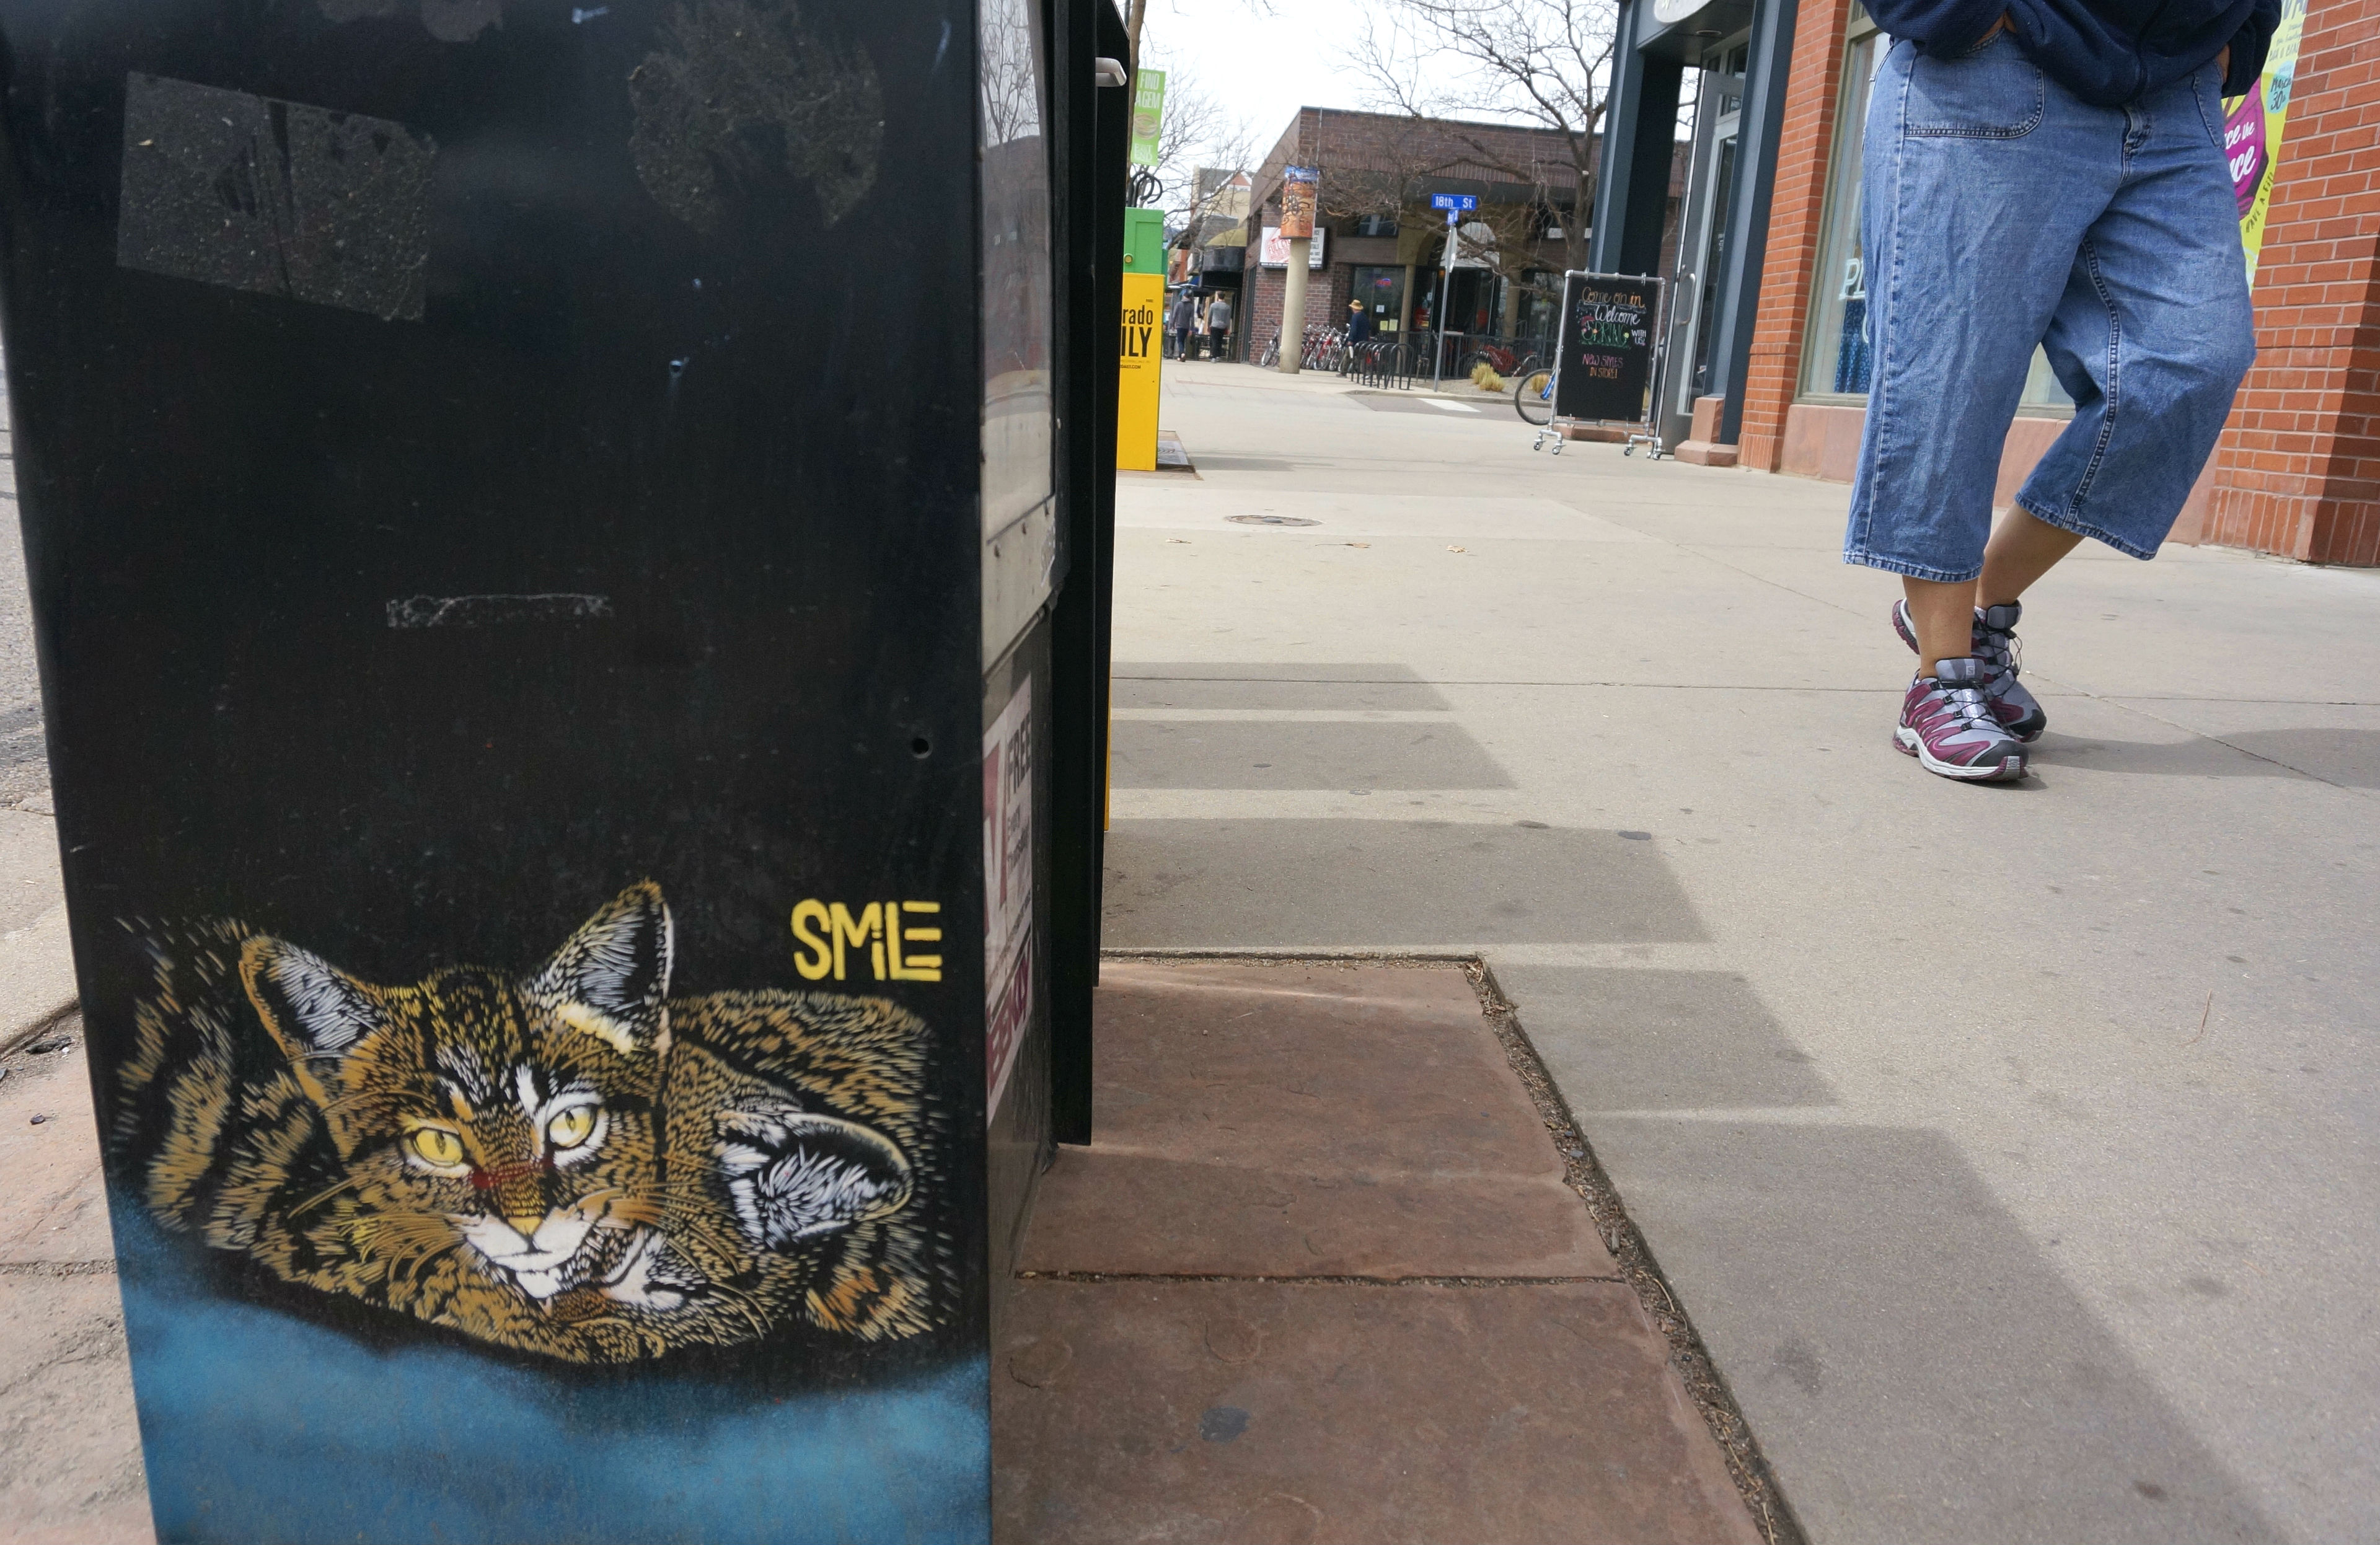 Photo: SMiLE artwork, Cat, Pearl Street, Boulder